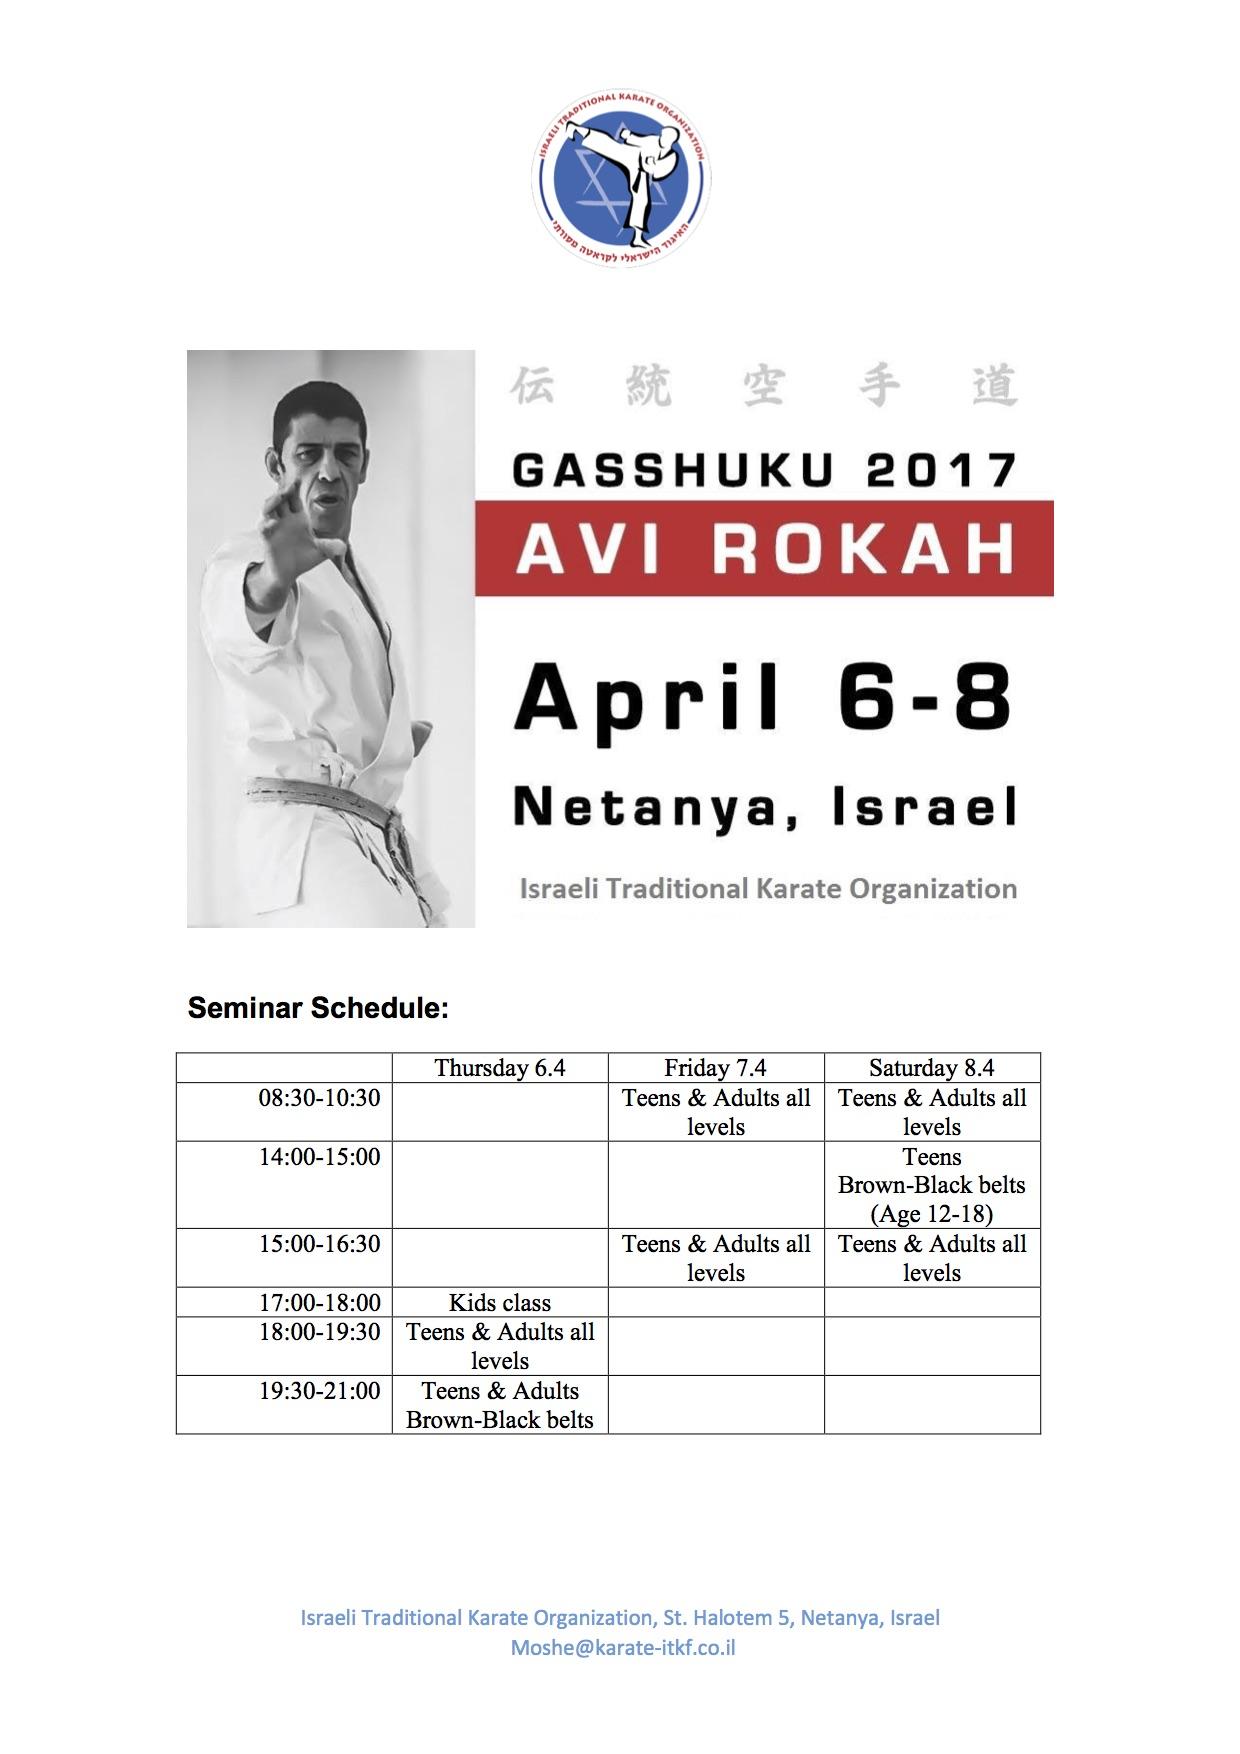 Netanya, Israel 6-8.04.2017